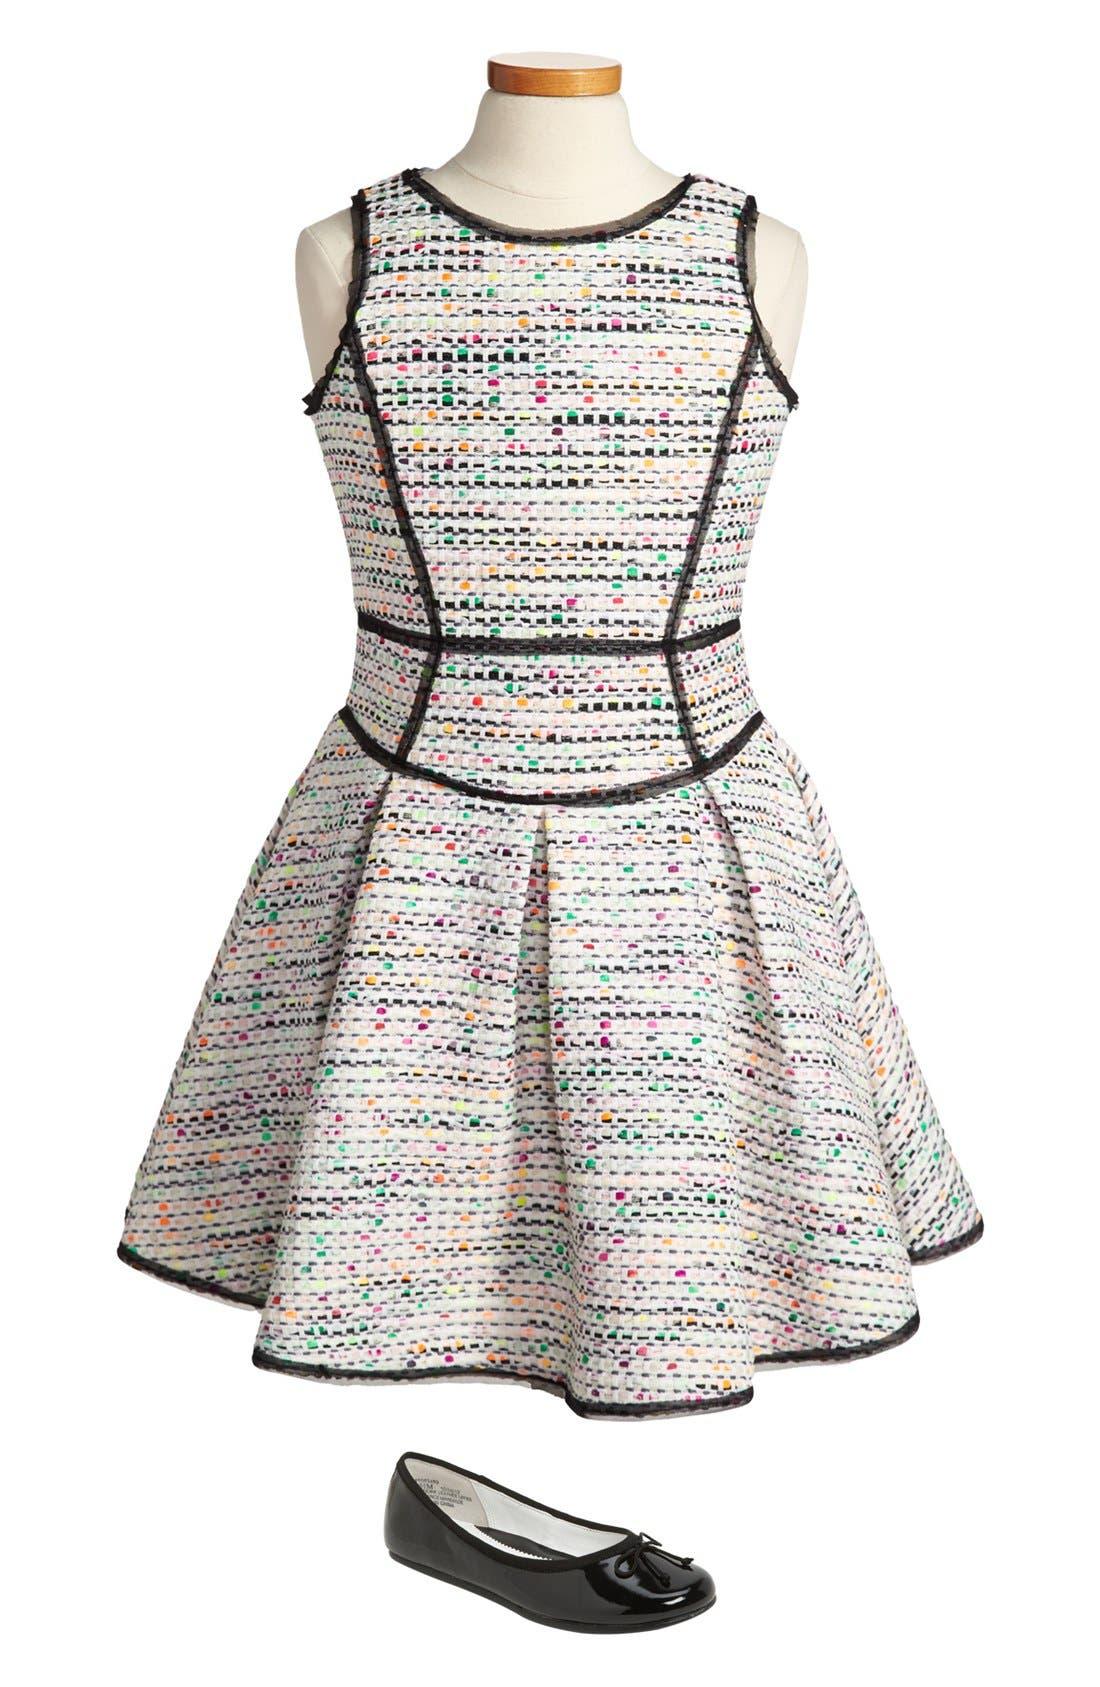 Alternate Image 1 Selected - Milly Minis Tweed Dress & Nordstrom Ballet Flat (Big Girls)